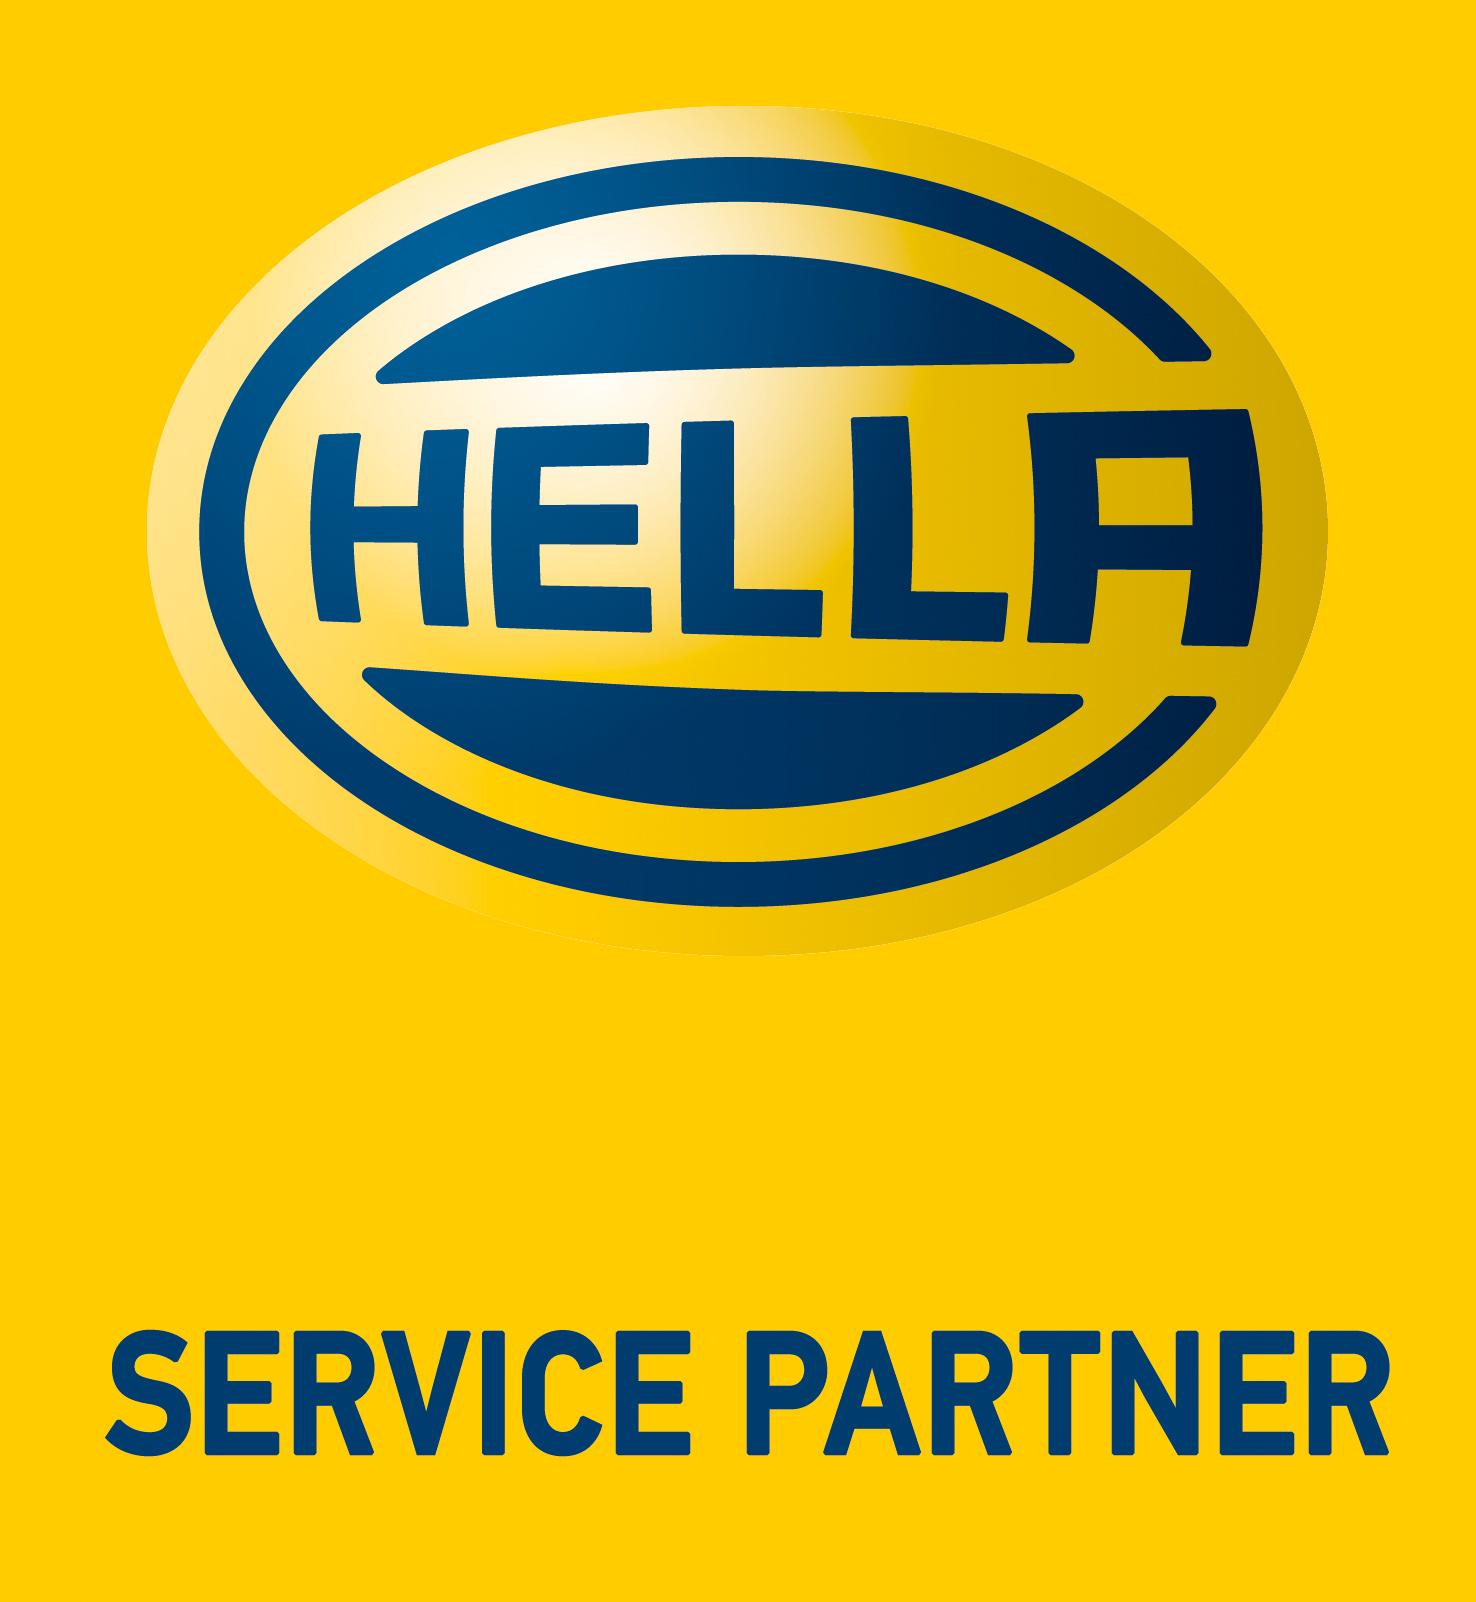 Kirk Auto - Hella Service Partner logo